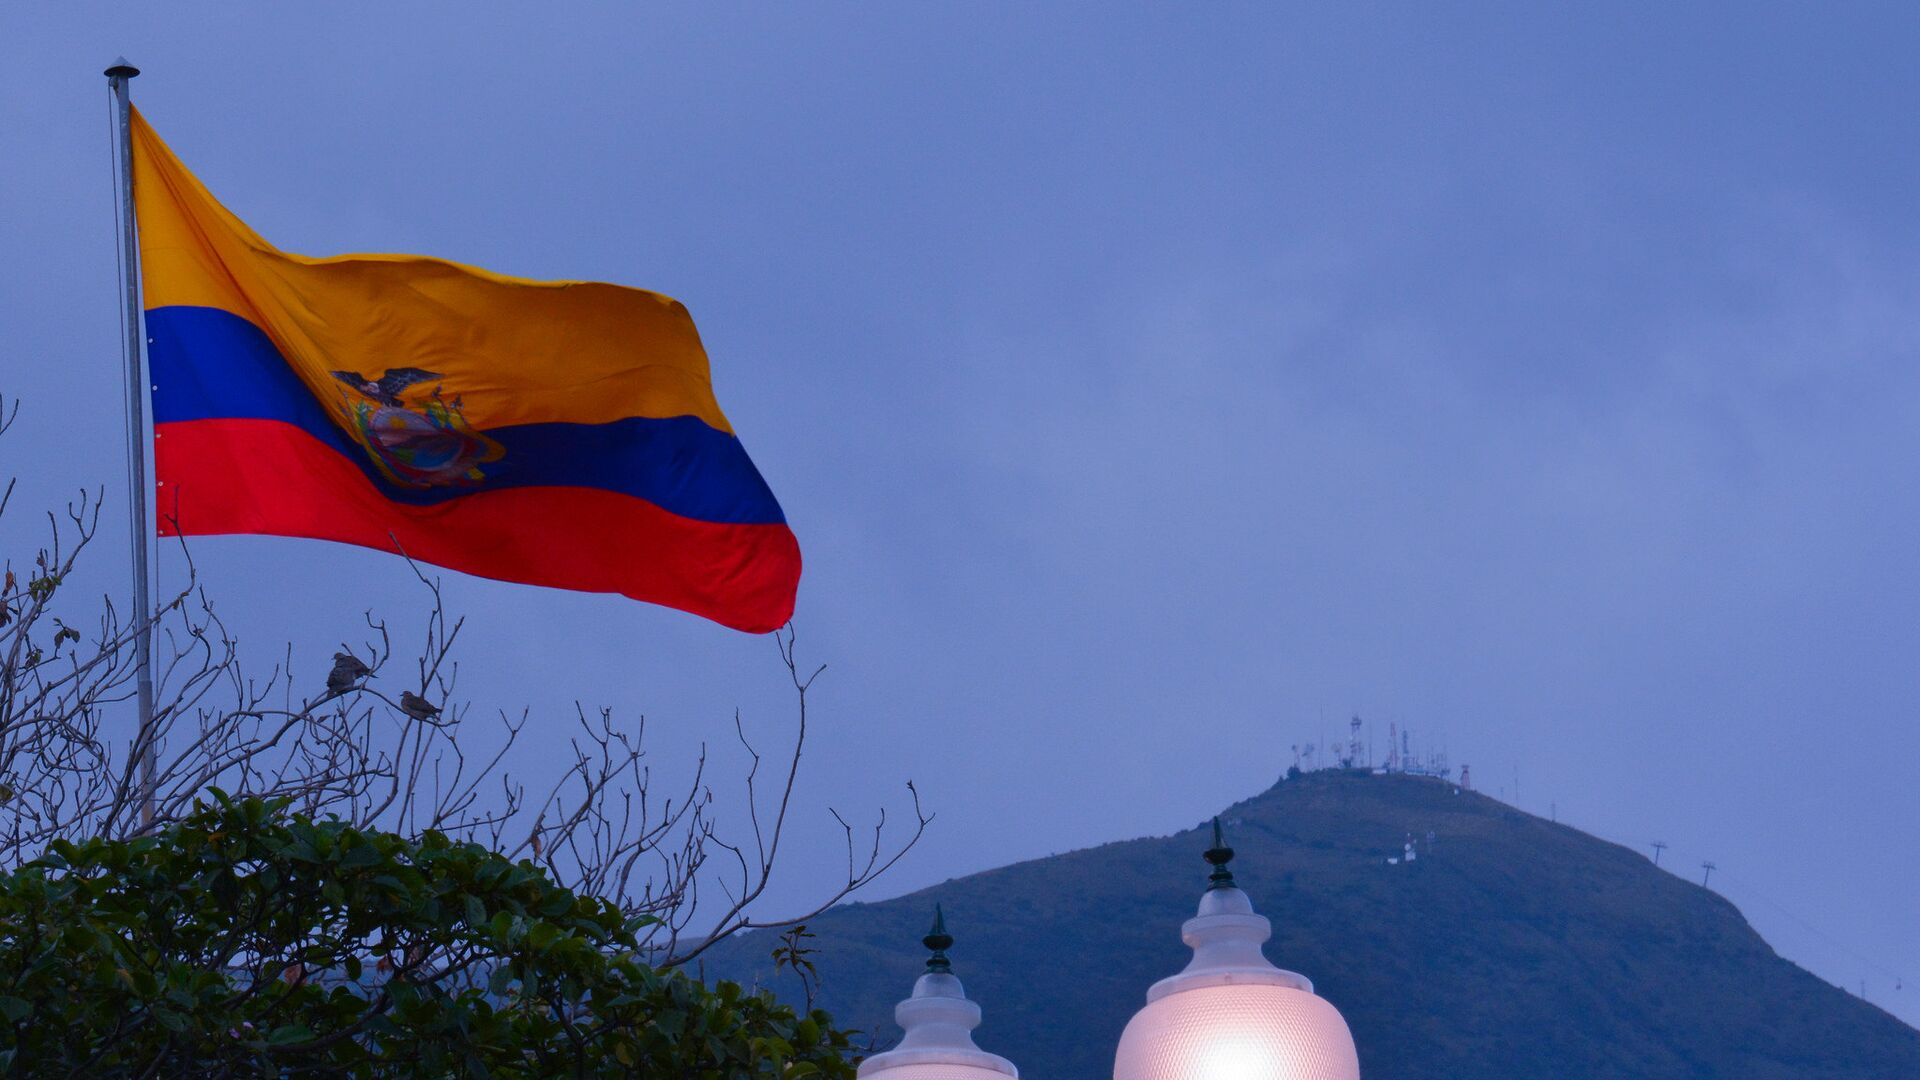 La bandera de Ecuador - Sputnik Mundo, 1920, 17.06.2021